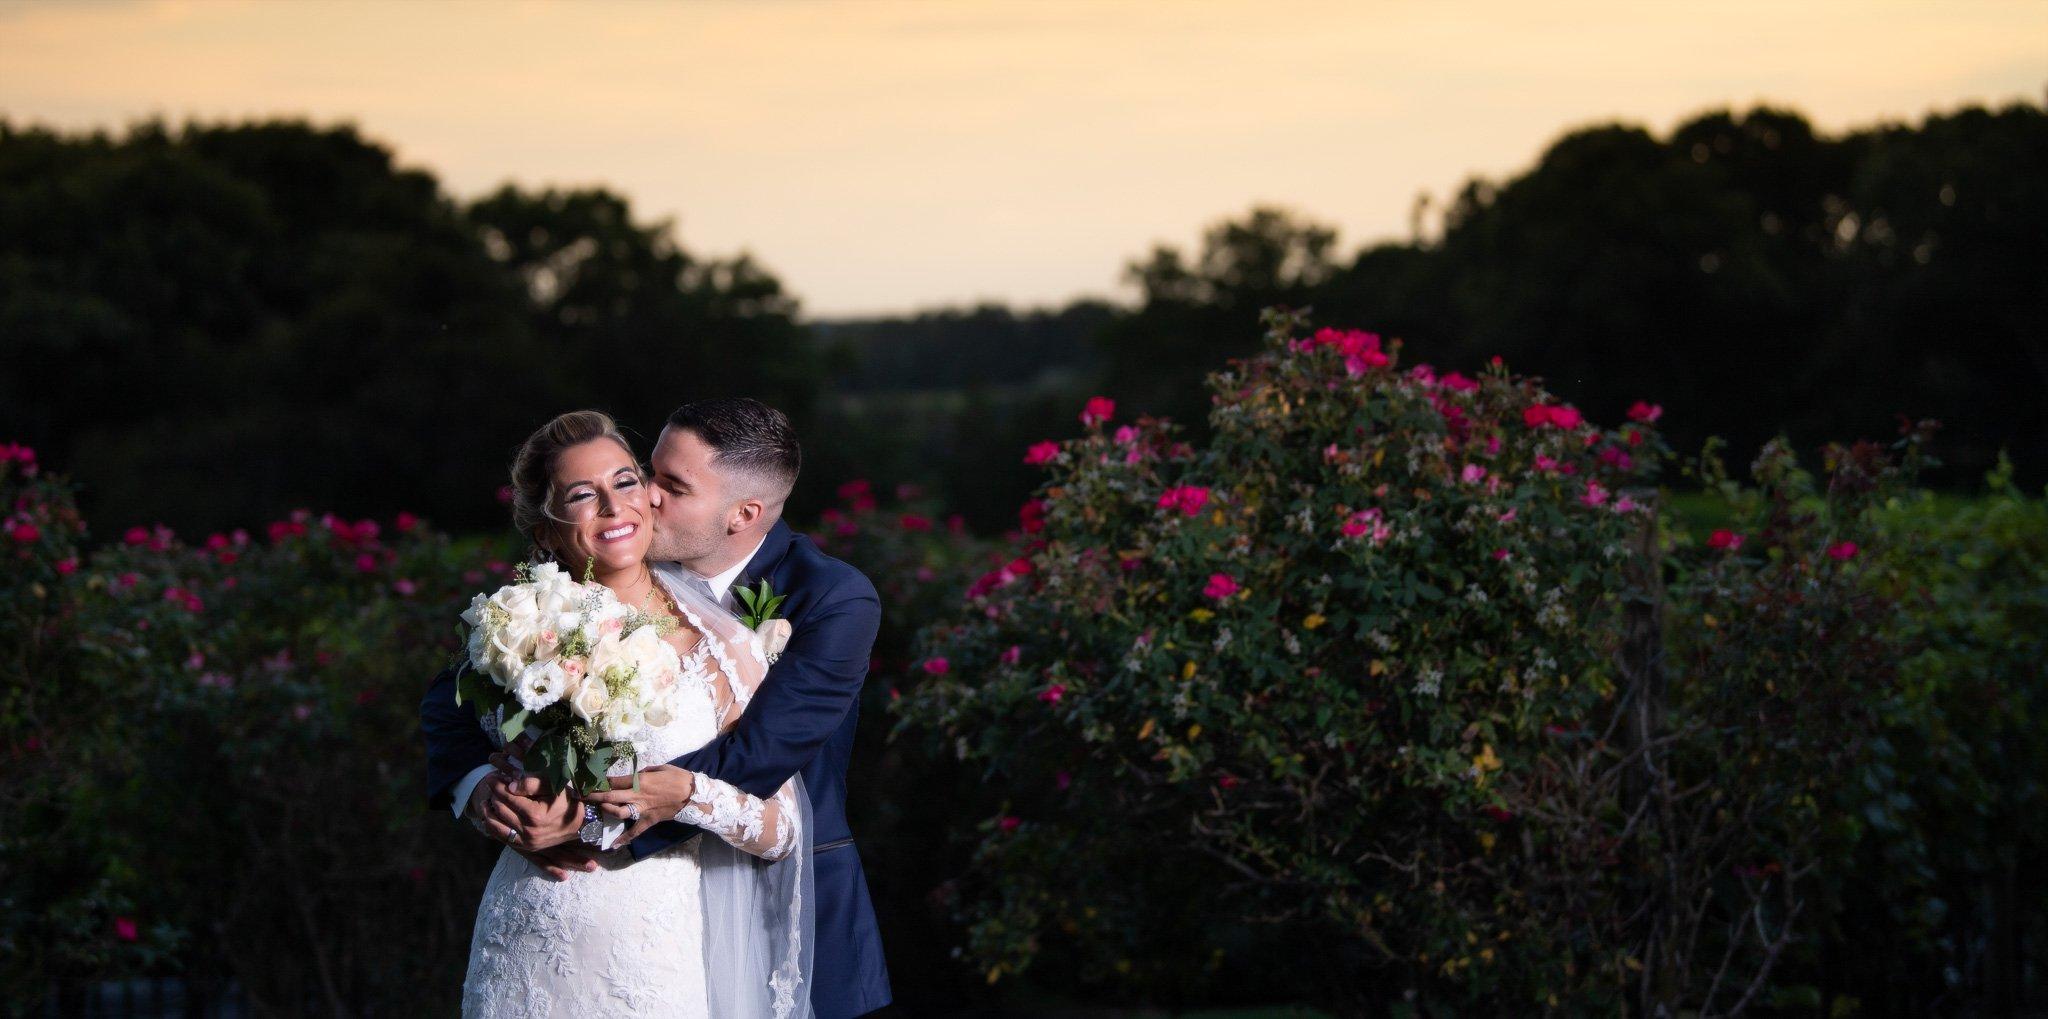 Giorgios Baiting Hollow Wedding Photos